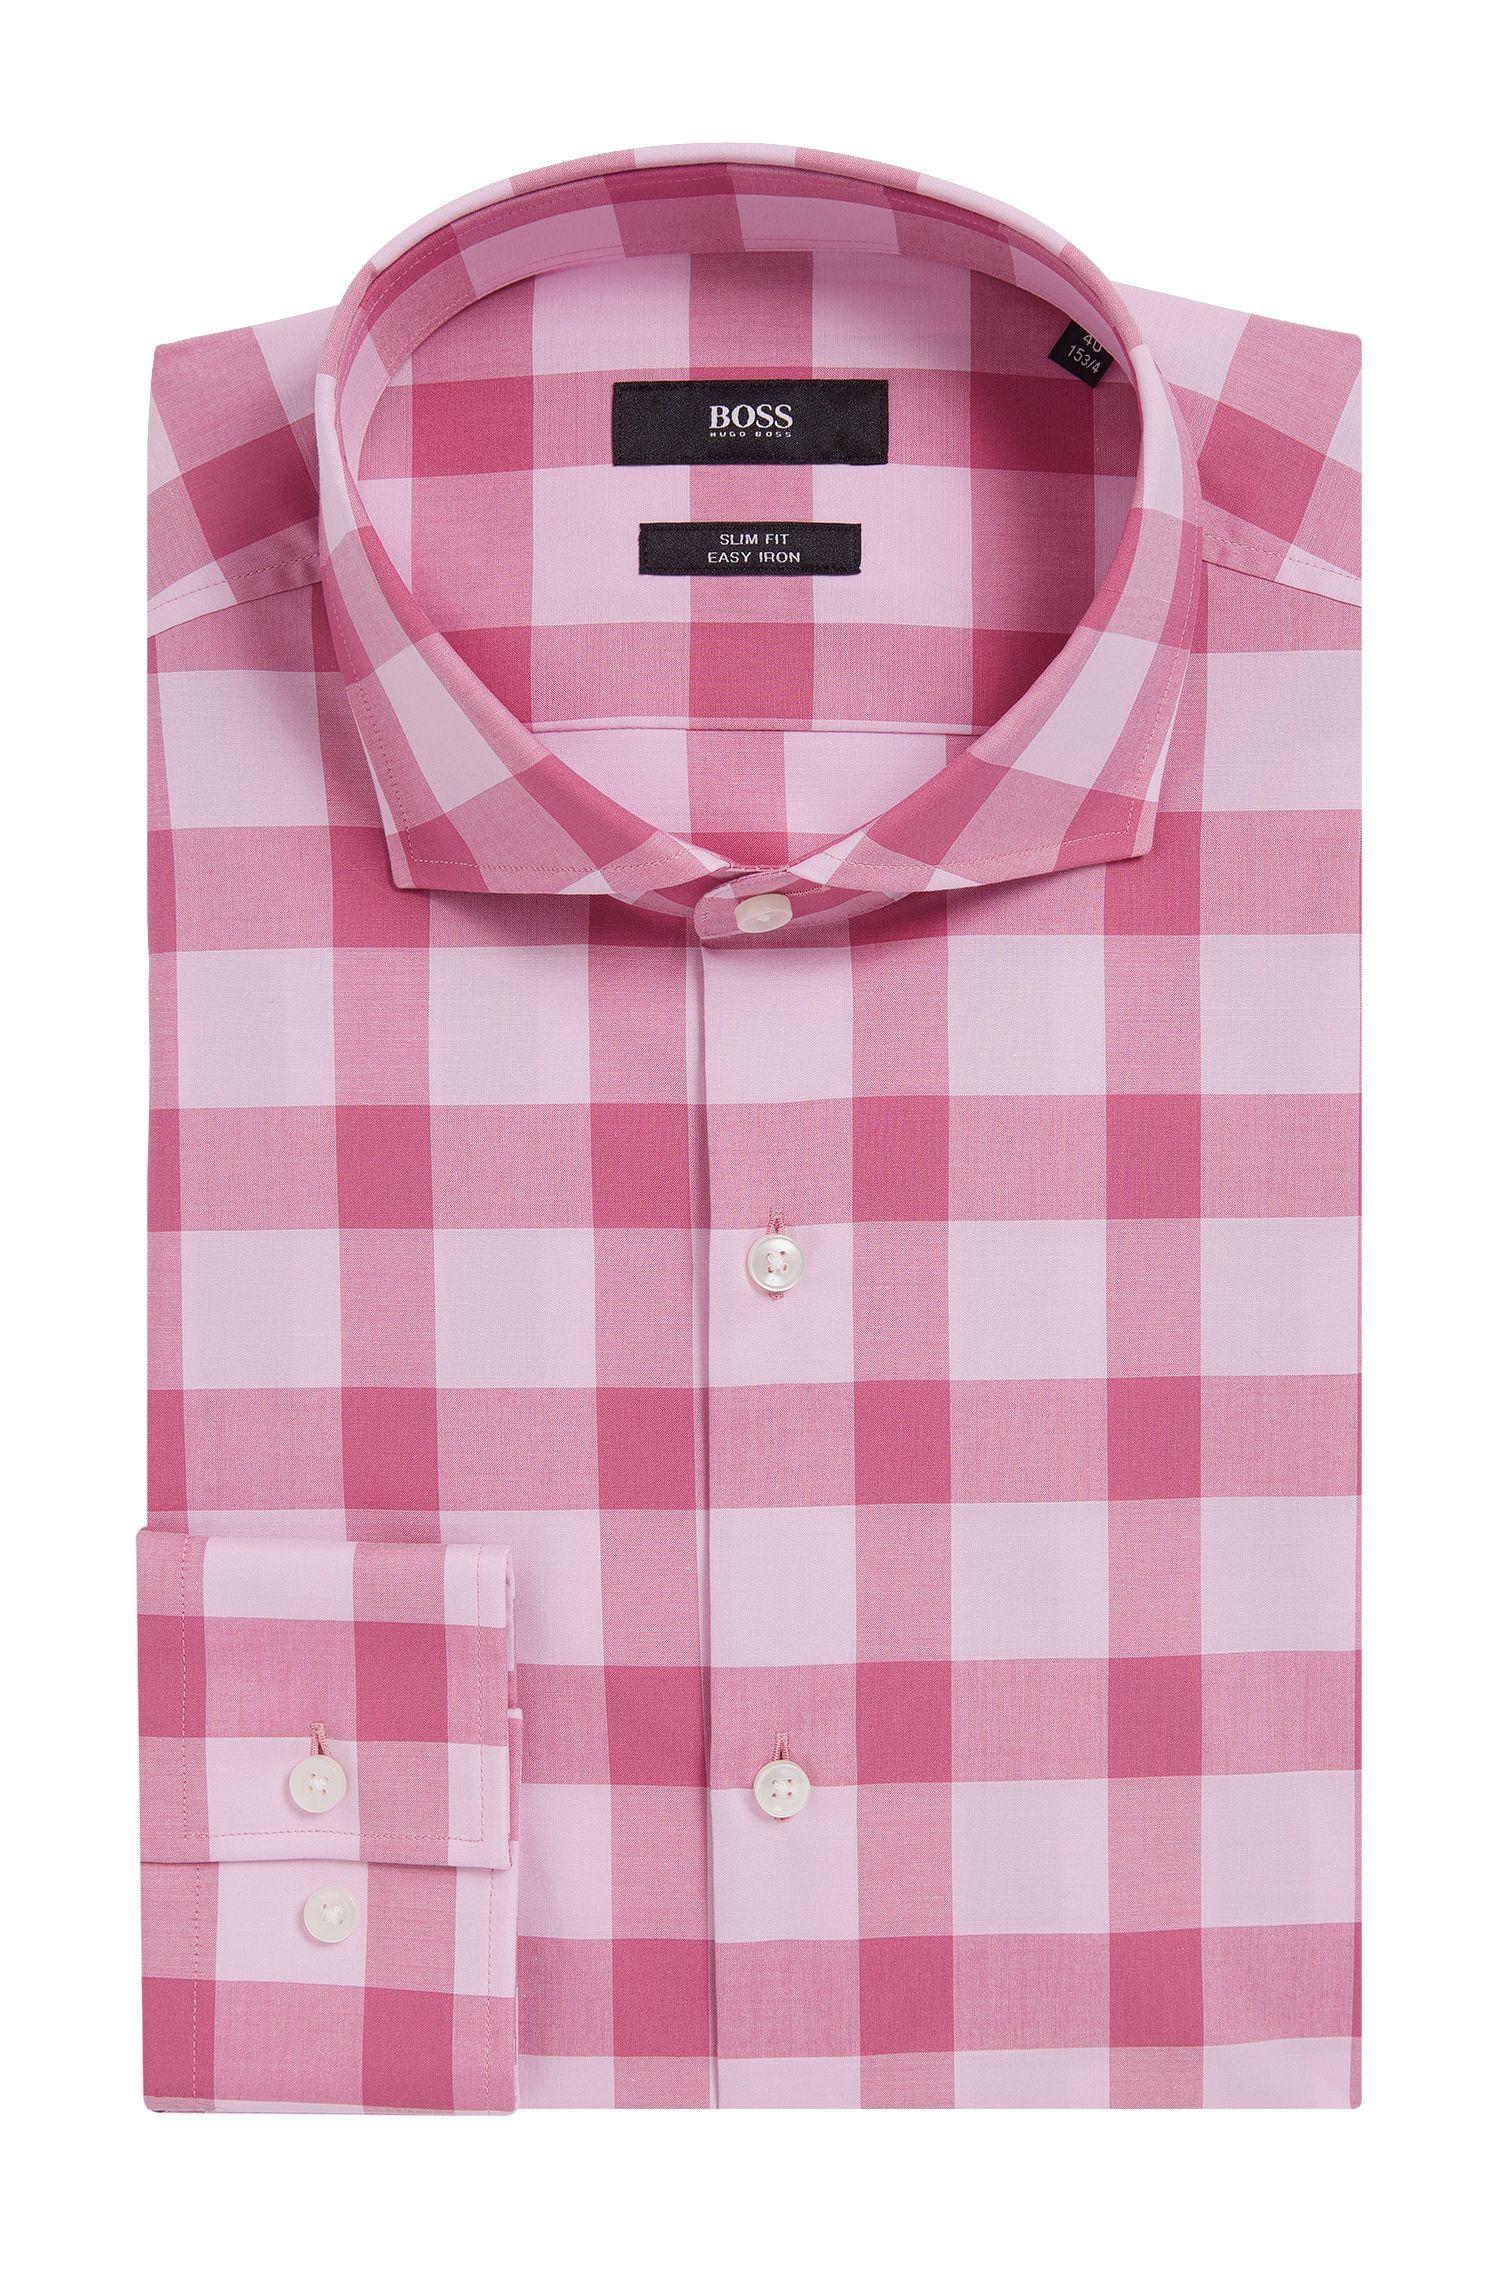 Buffalo Check Cotton Easy Iron Dress Shirt, Slim Fit | Jason